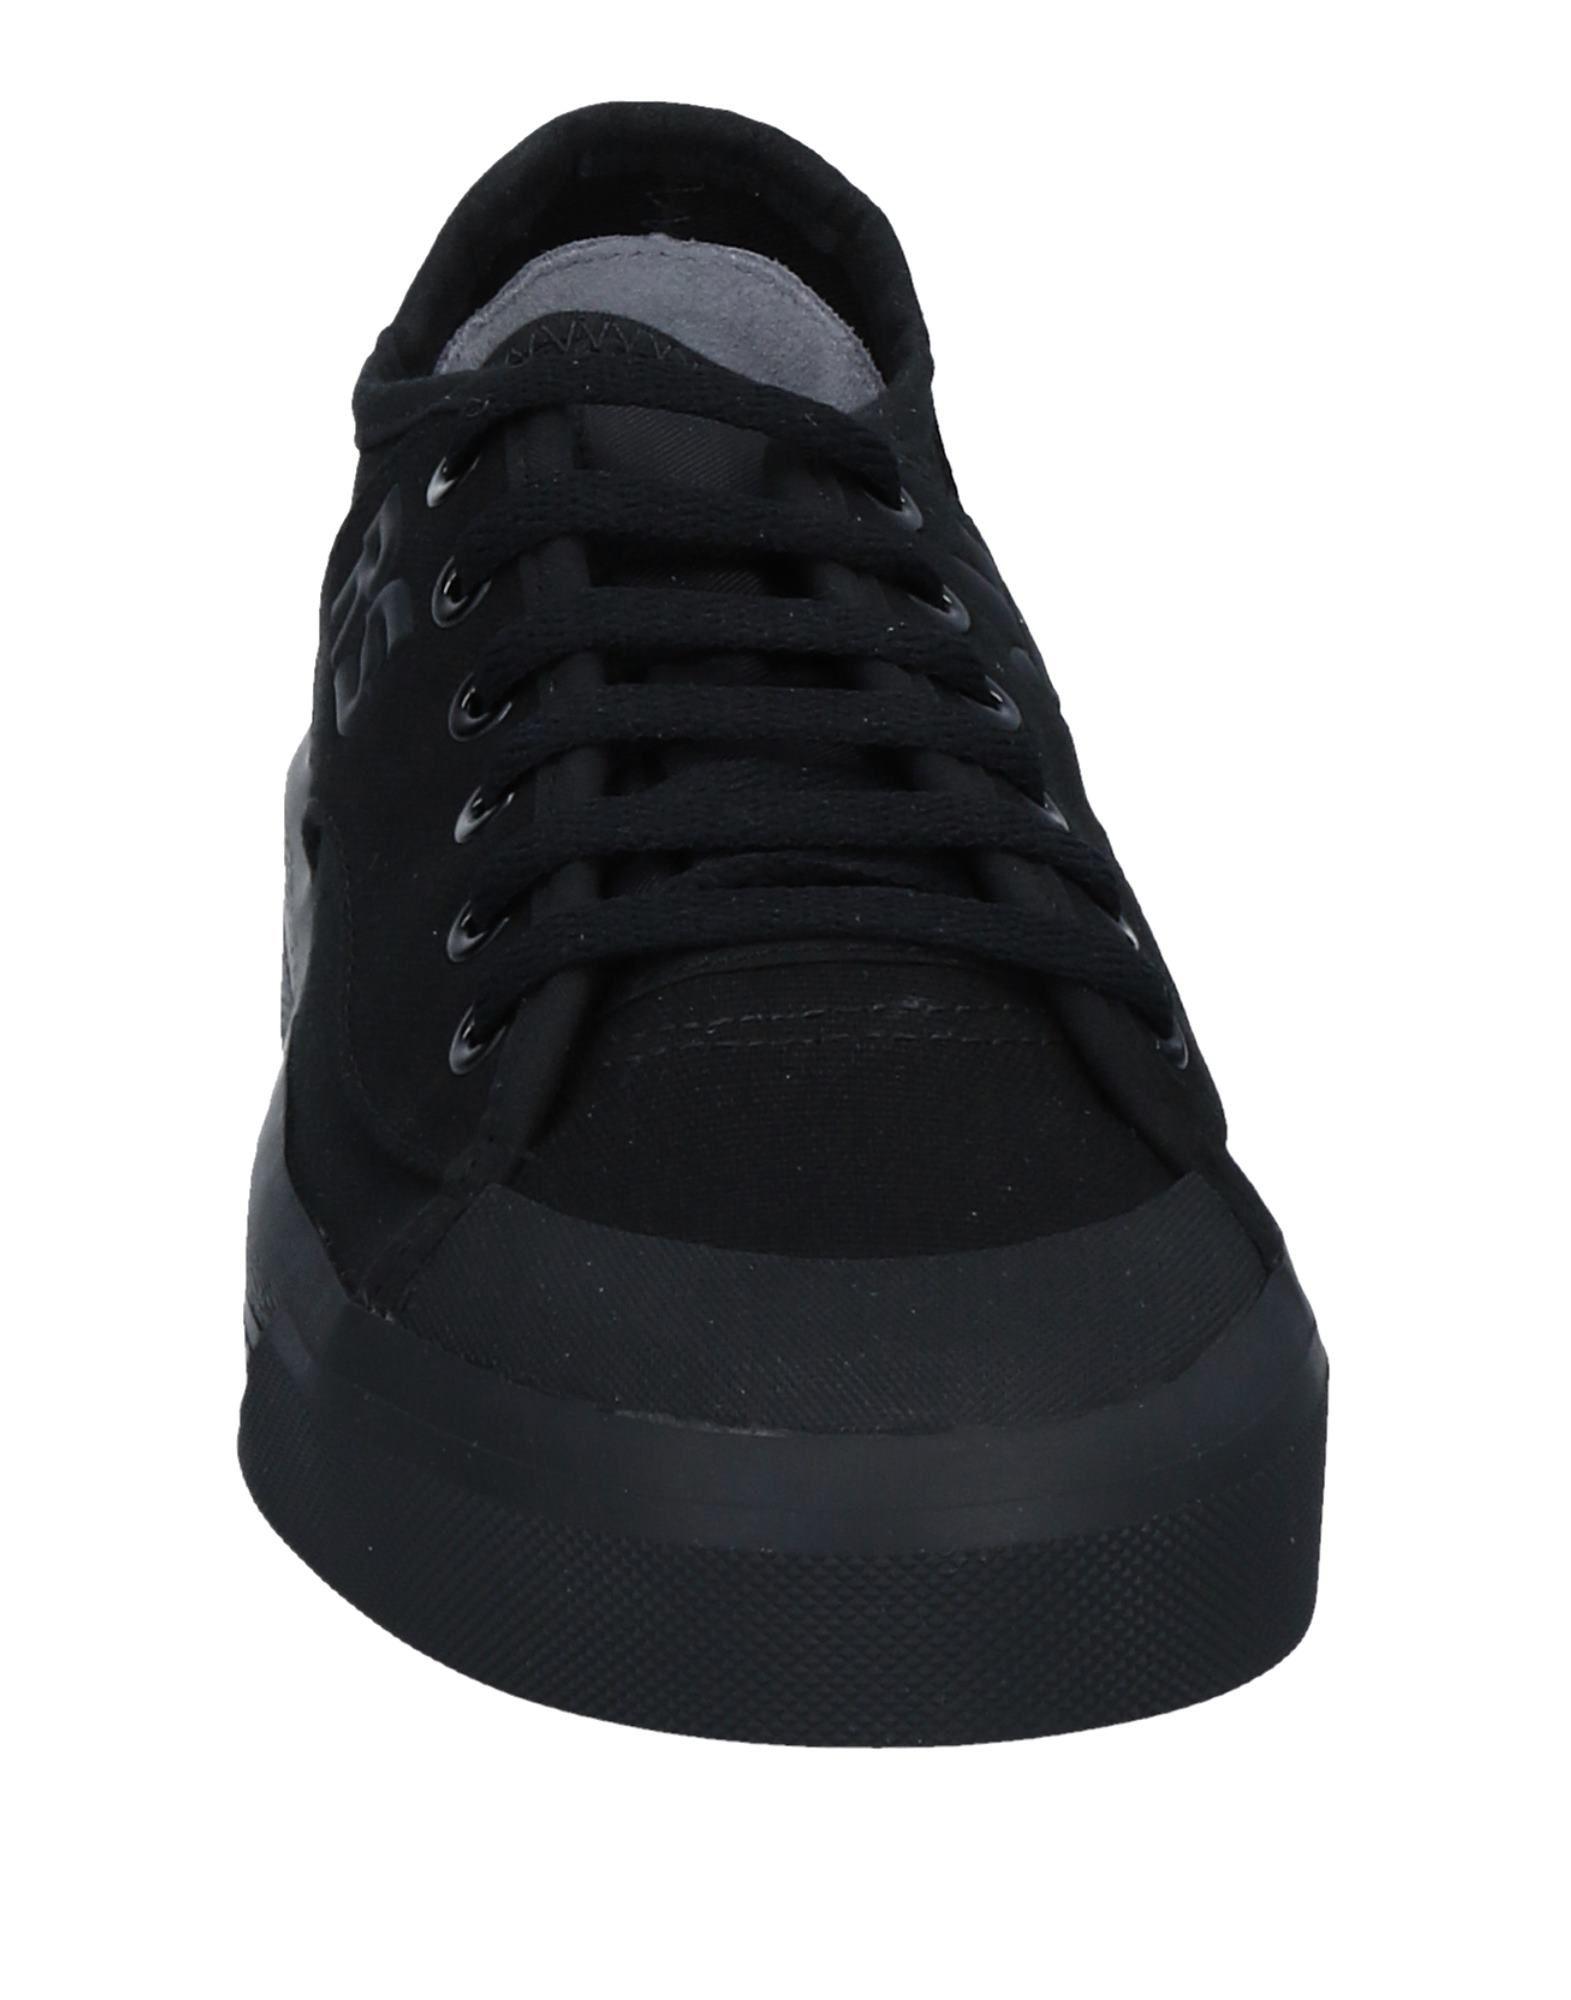 Adidas Adidas Adidas By Raf Simons Sneakers Herren Gutes Preis-Leistungs-Verhältnis, es lohnt sich 7954a8